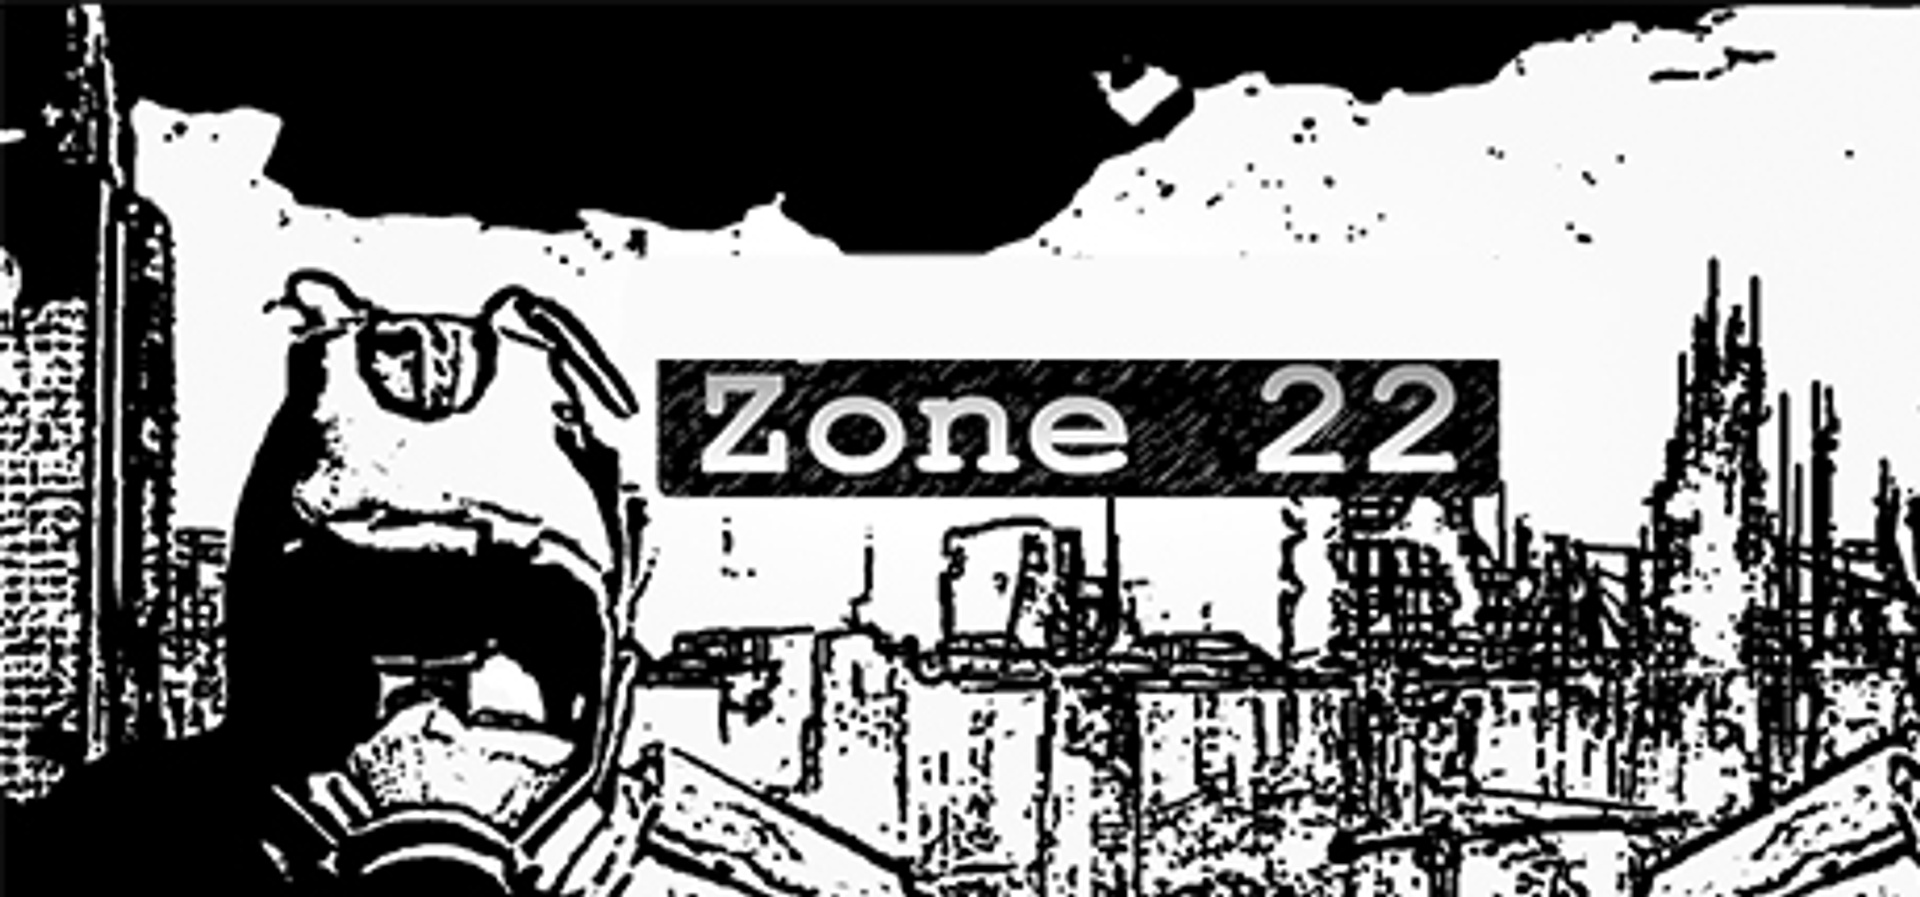 buy Zone 22 cd key for all platform